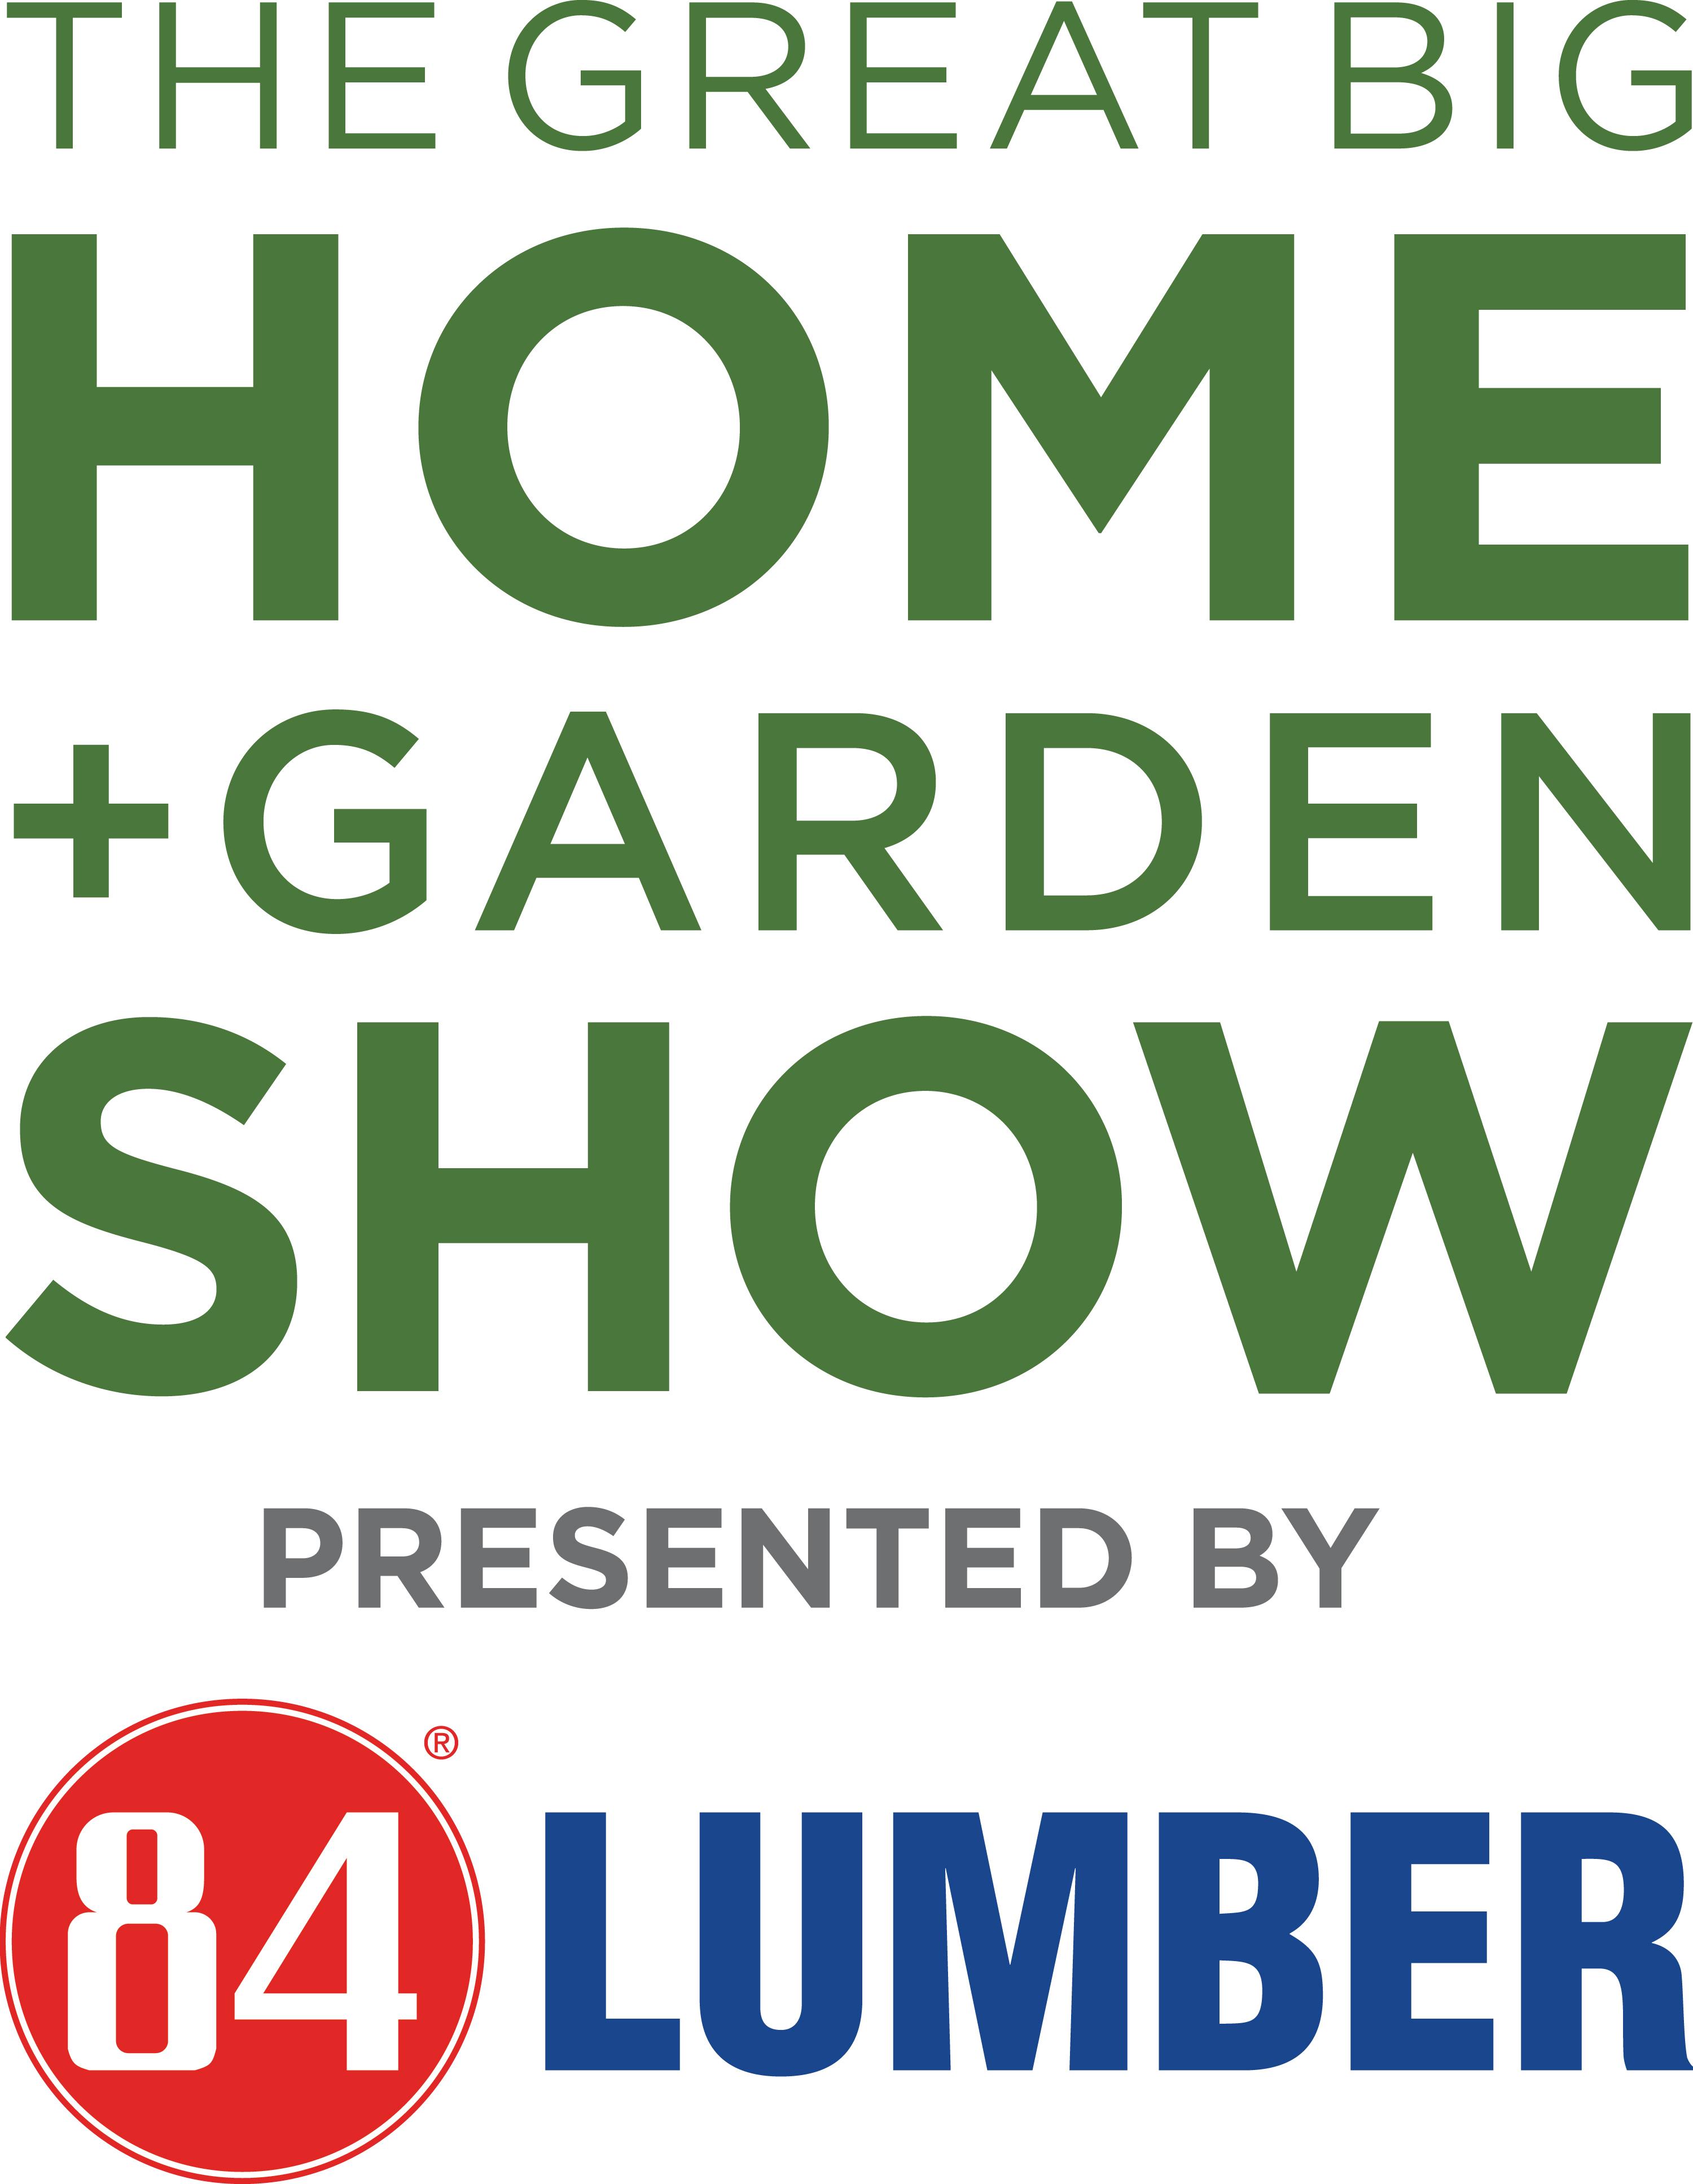 Great Big Home + Garden Show Logo